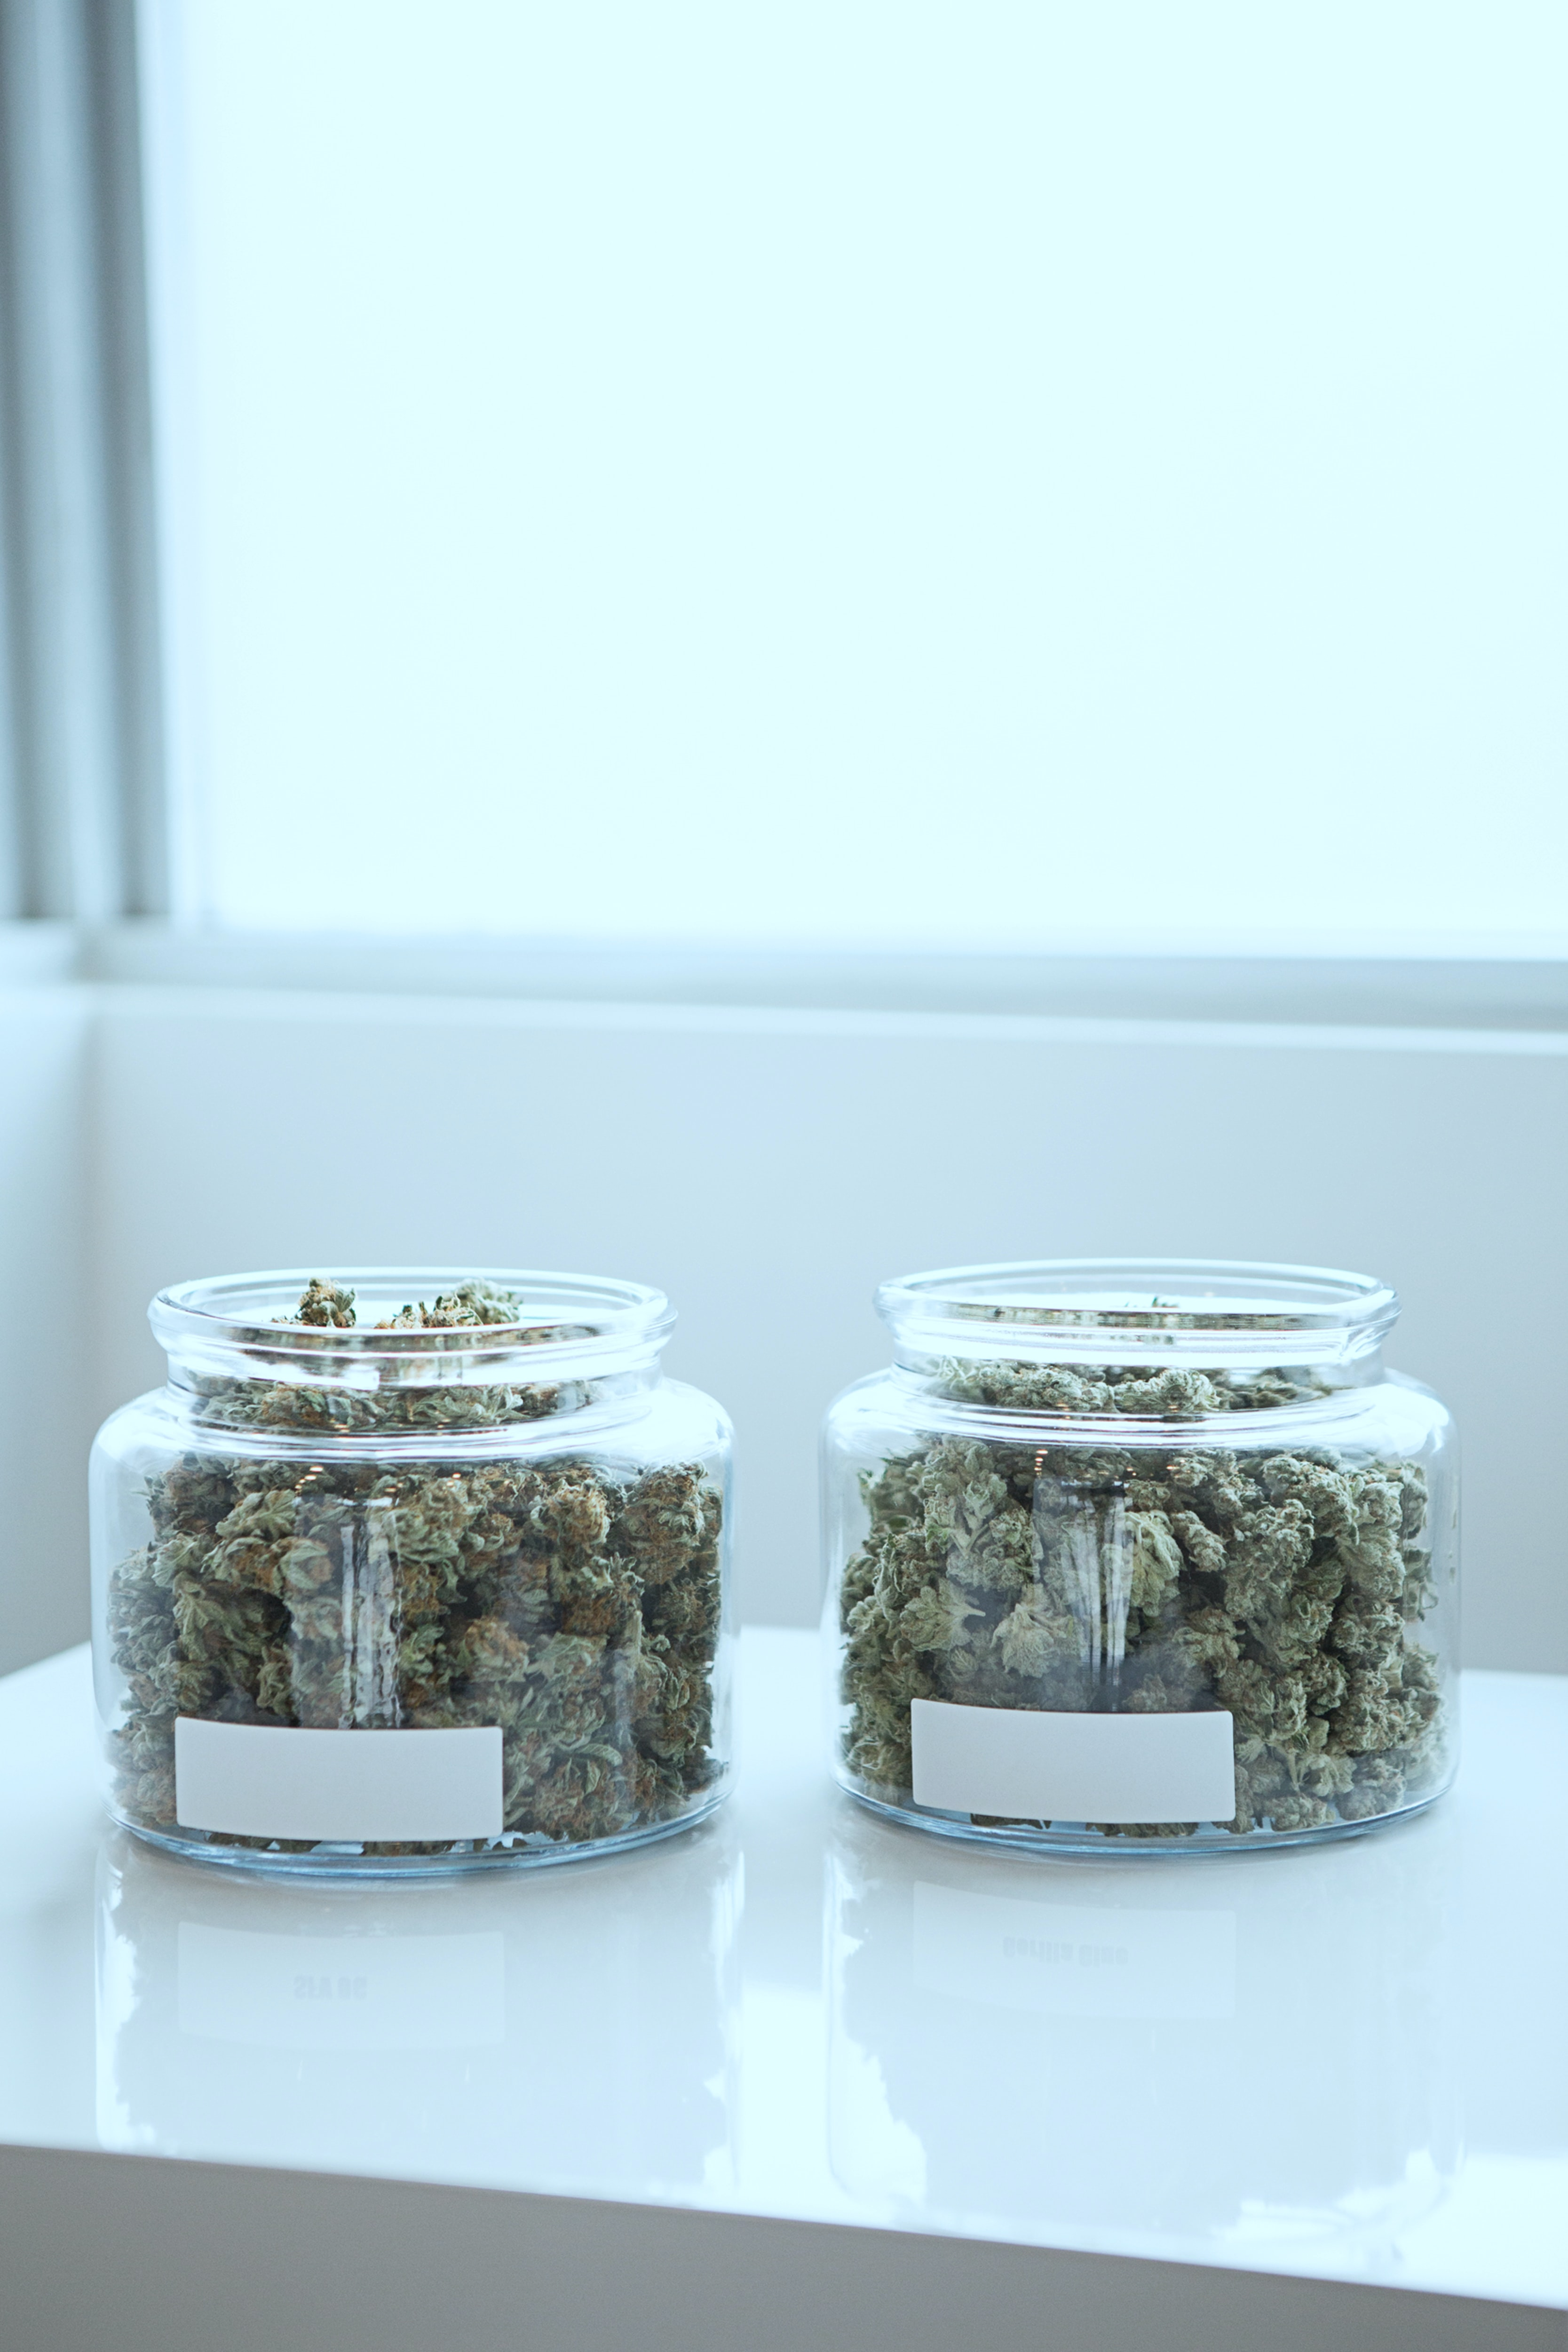 cannabis boutique